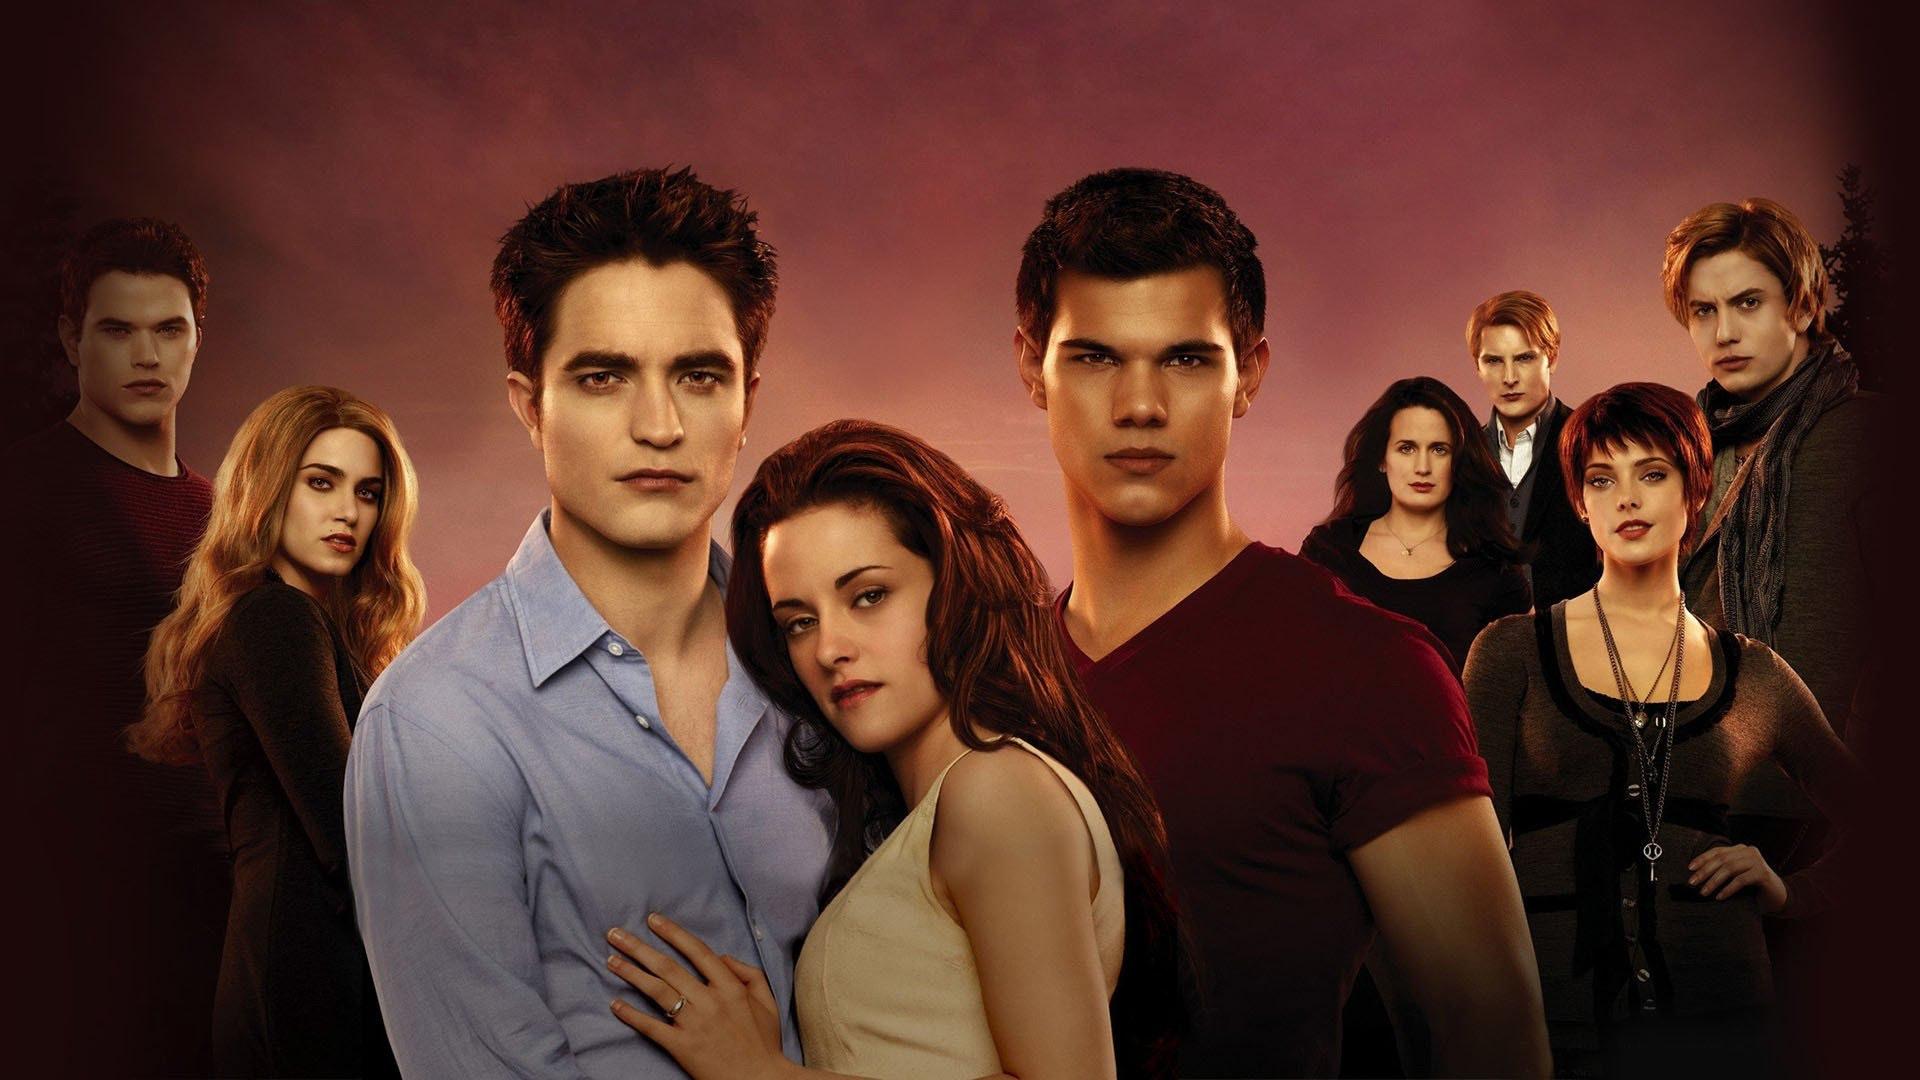 The Twilight Saga: Breaking Dawn - Part 1 Soundtrack